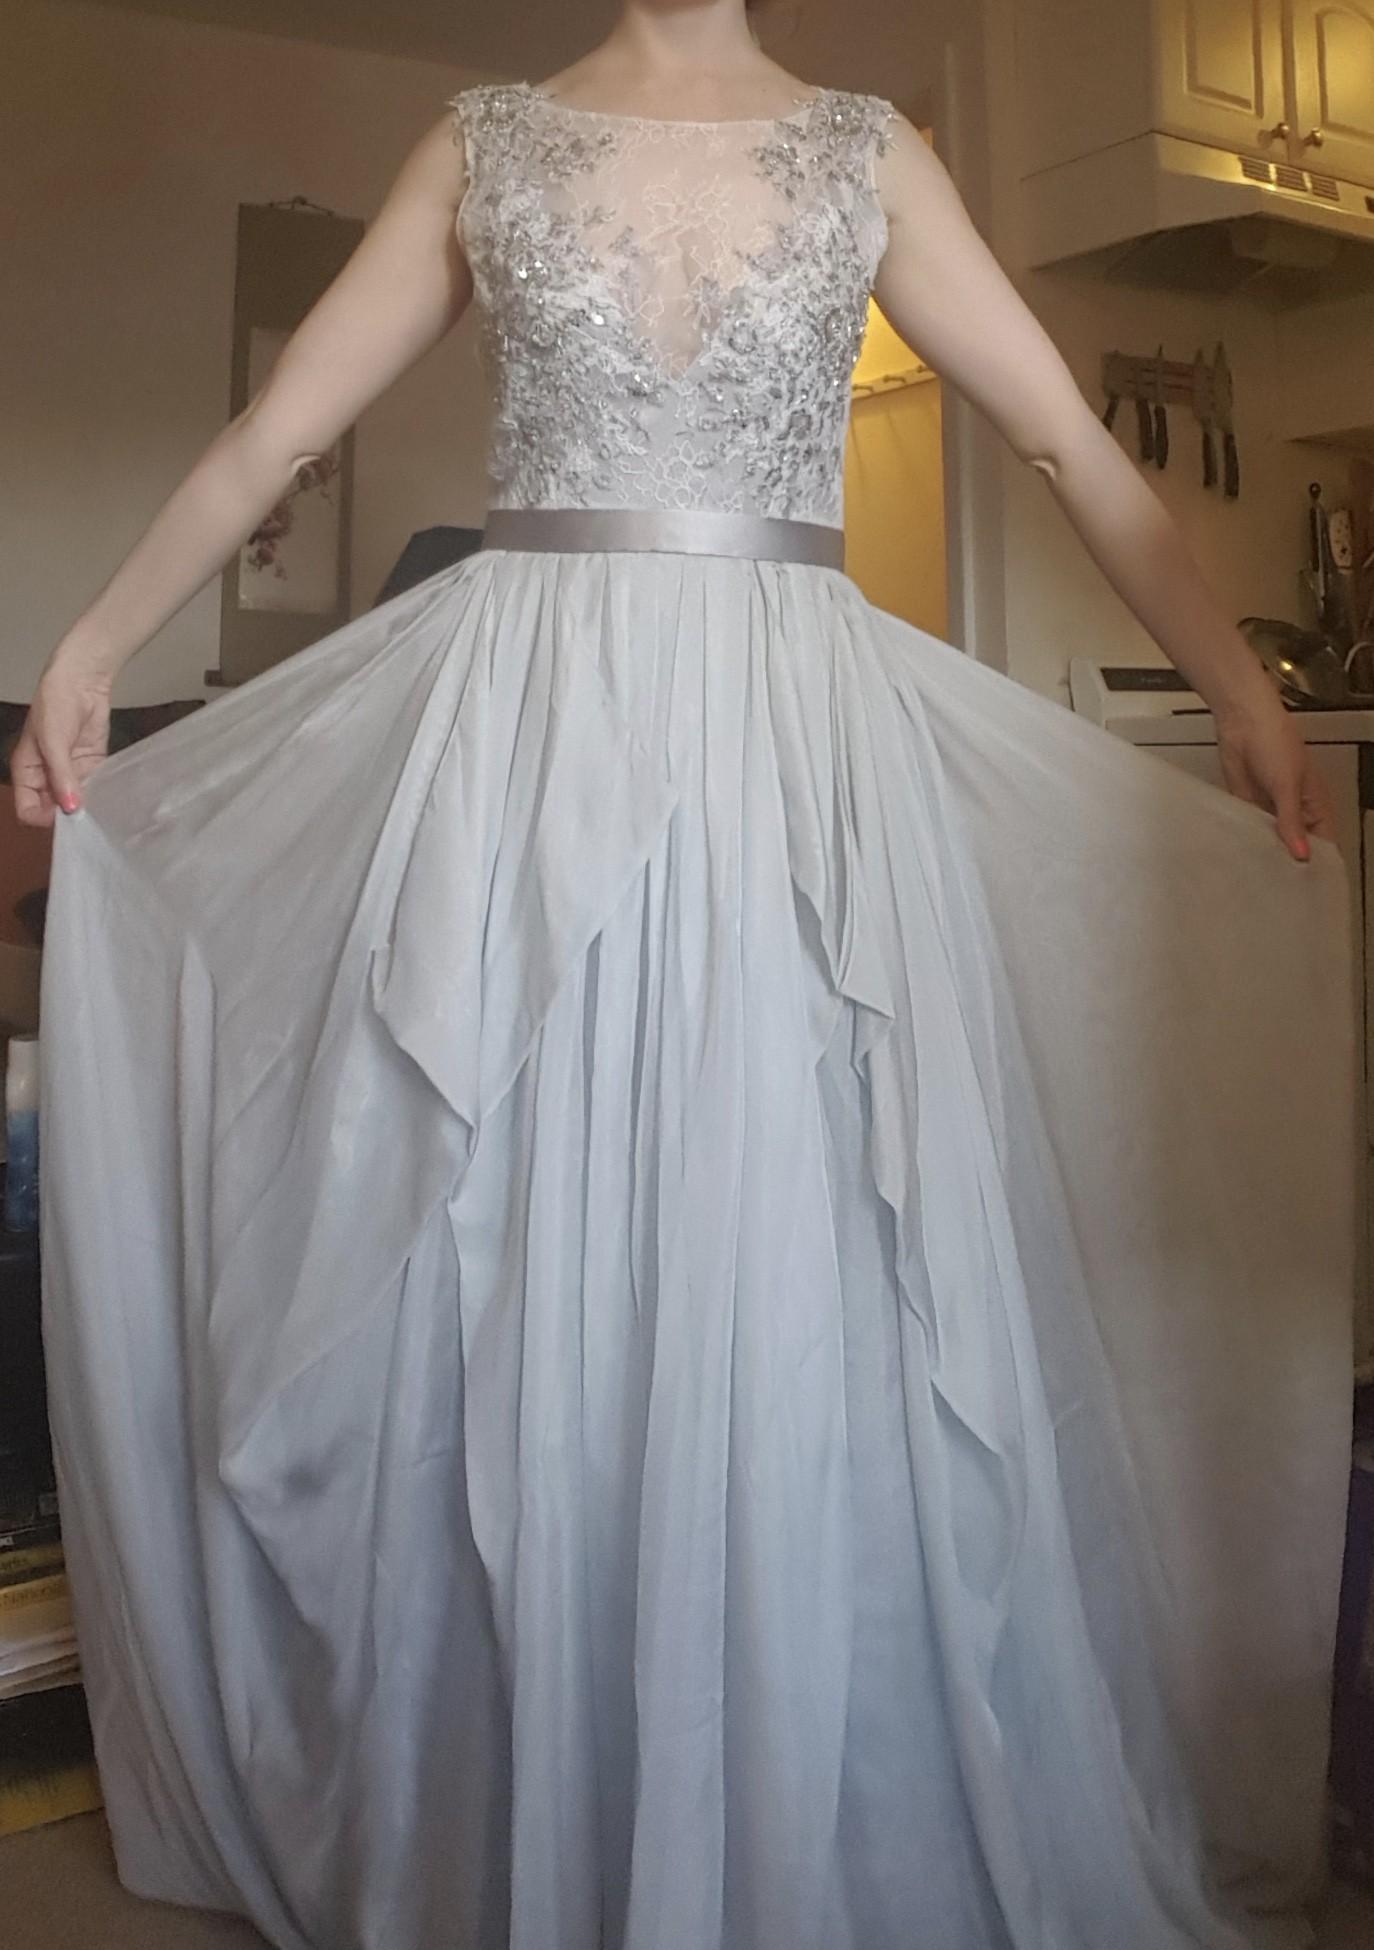 Mywony Bridal Lobelia - New Wedding Dresses - Stillwhite